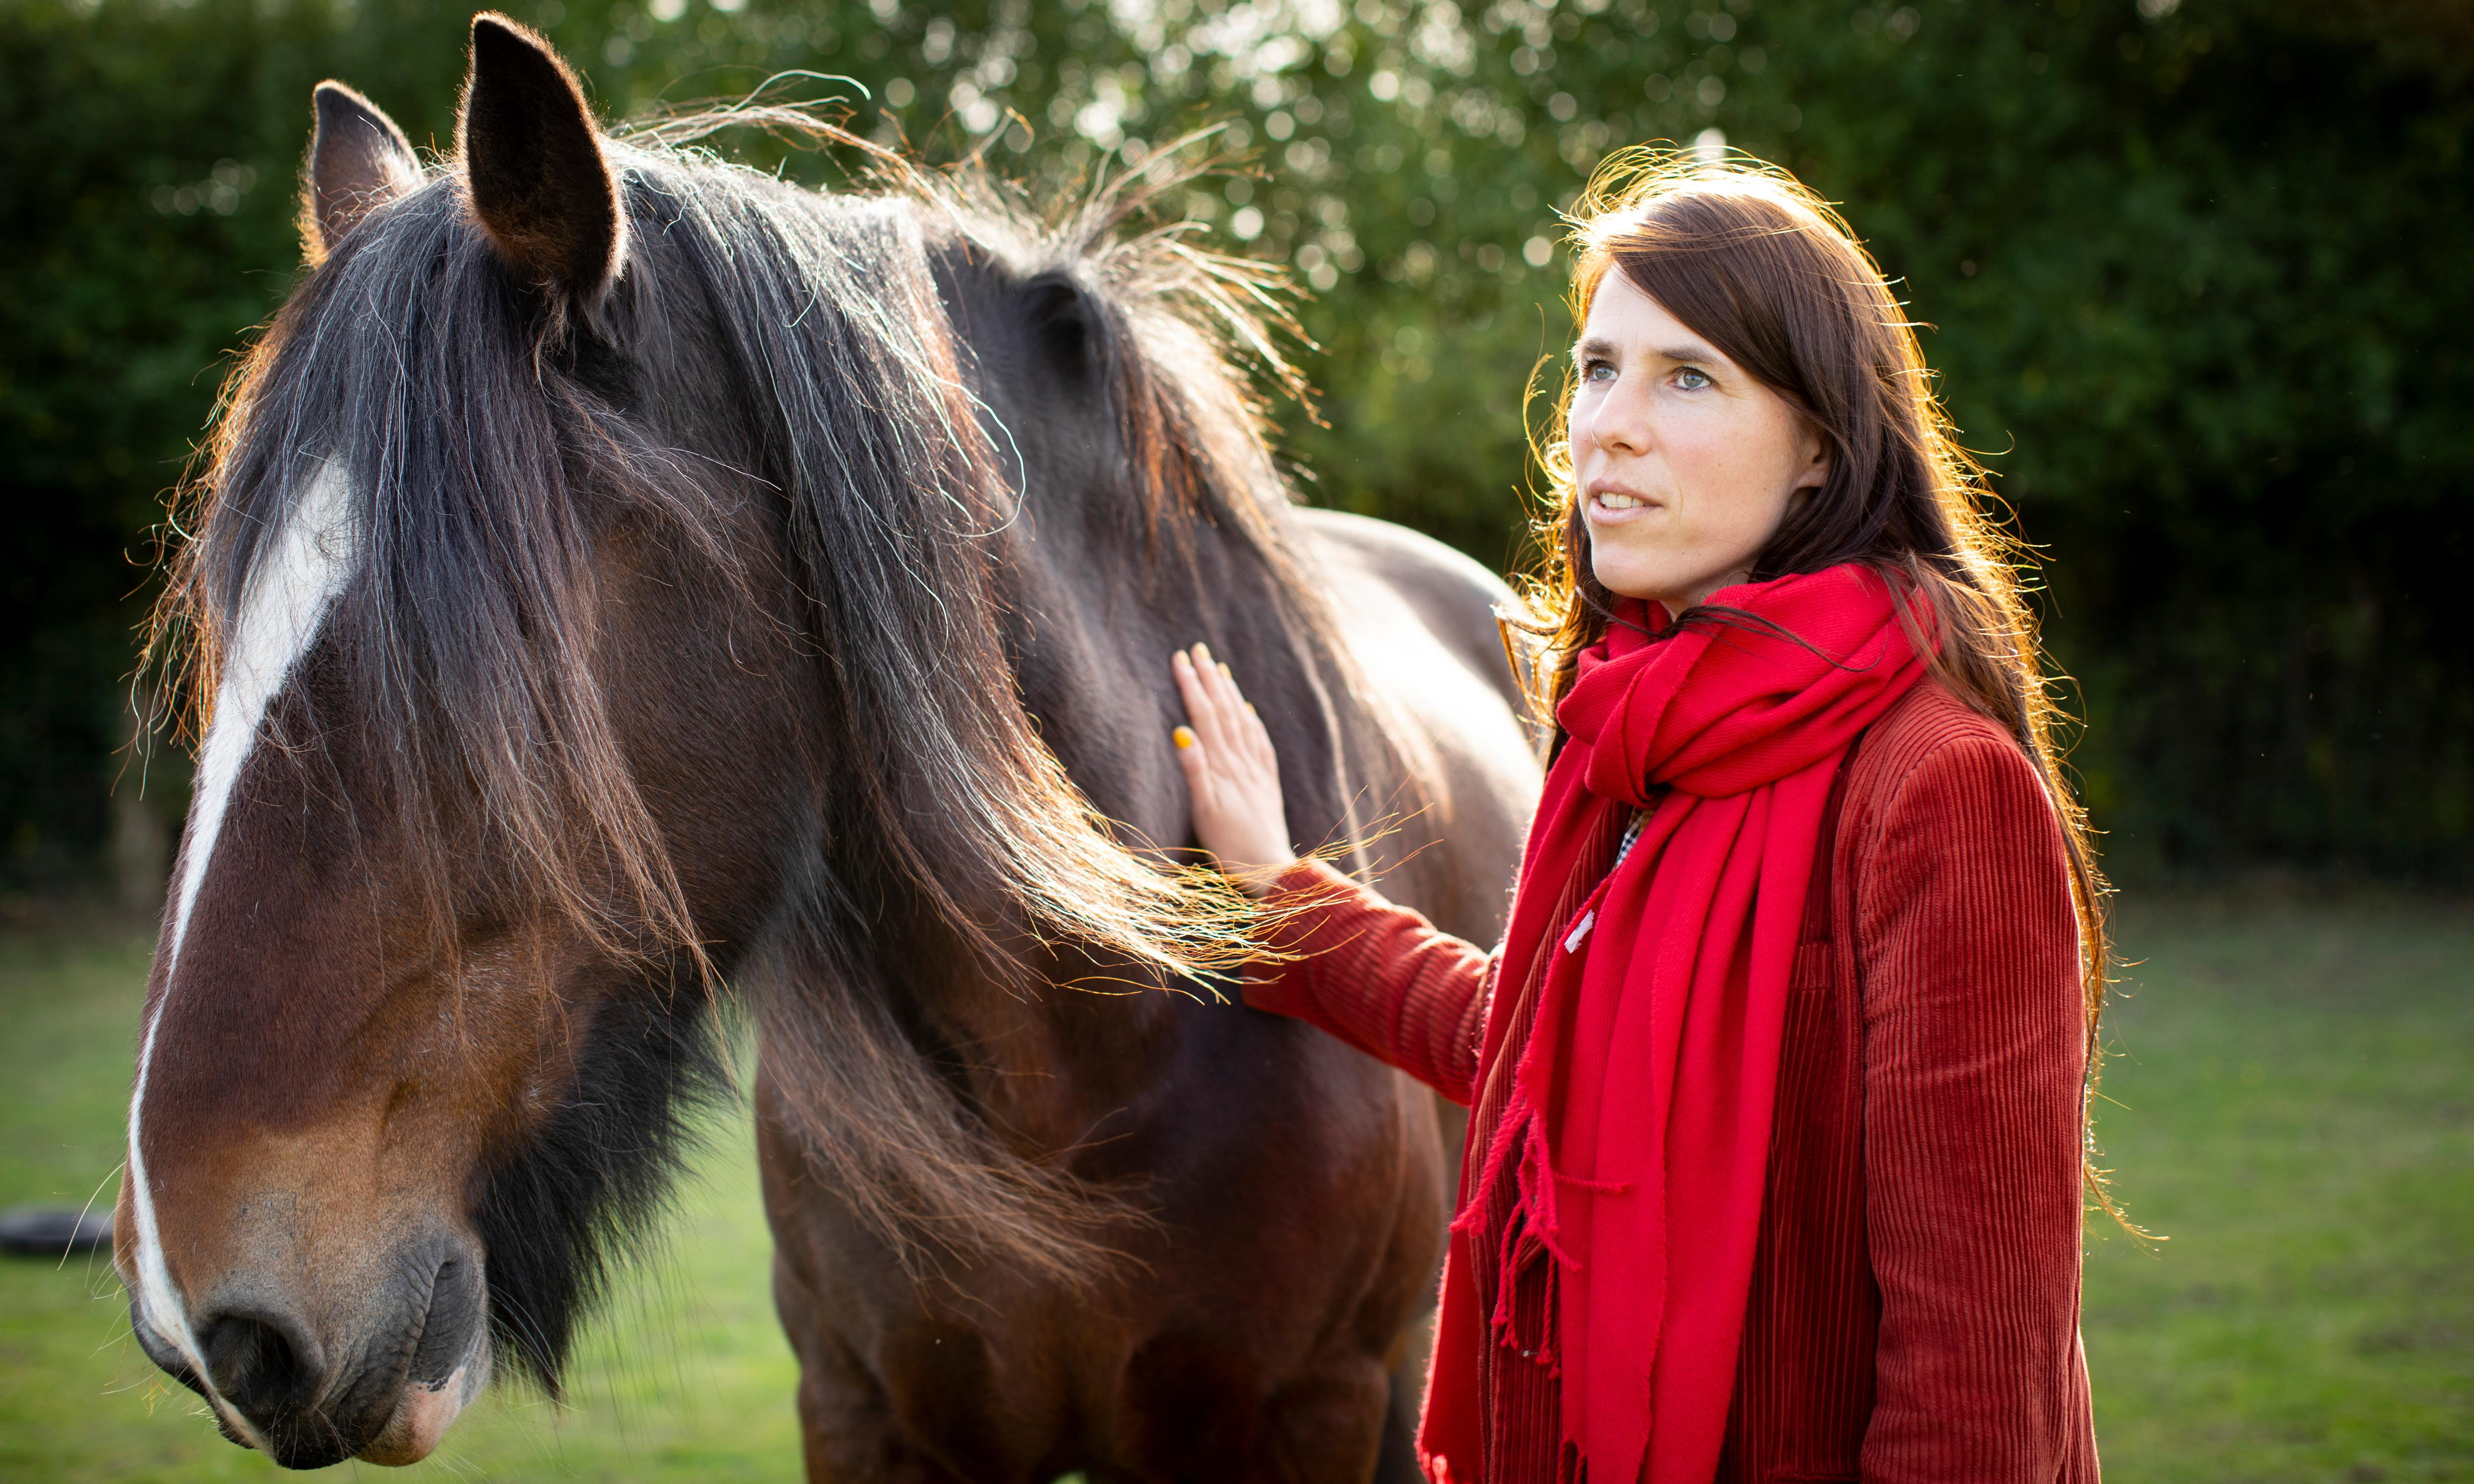 Eva Meijer: 'Of course animals speak. The thing is we don't listen'